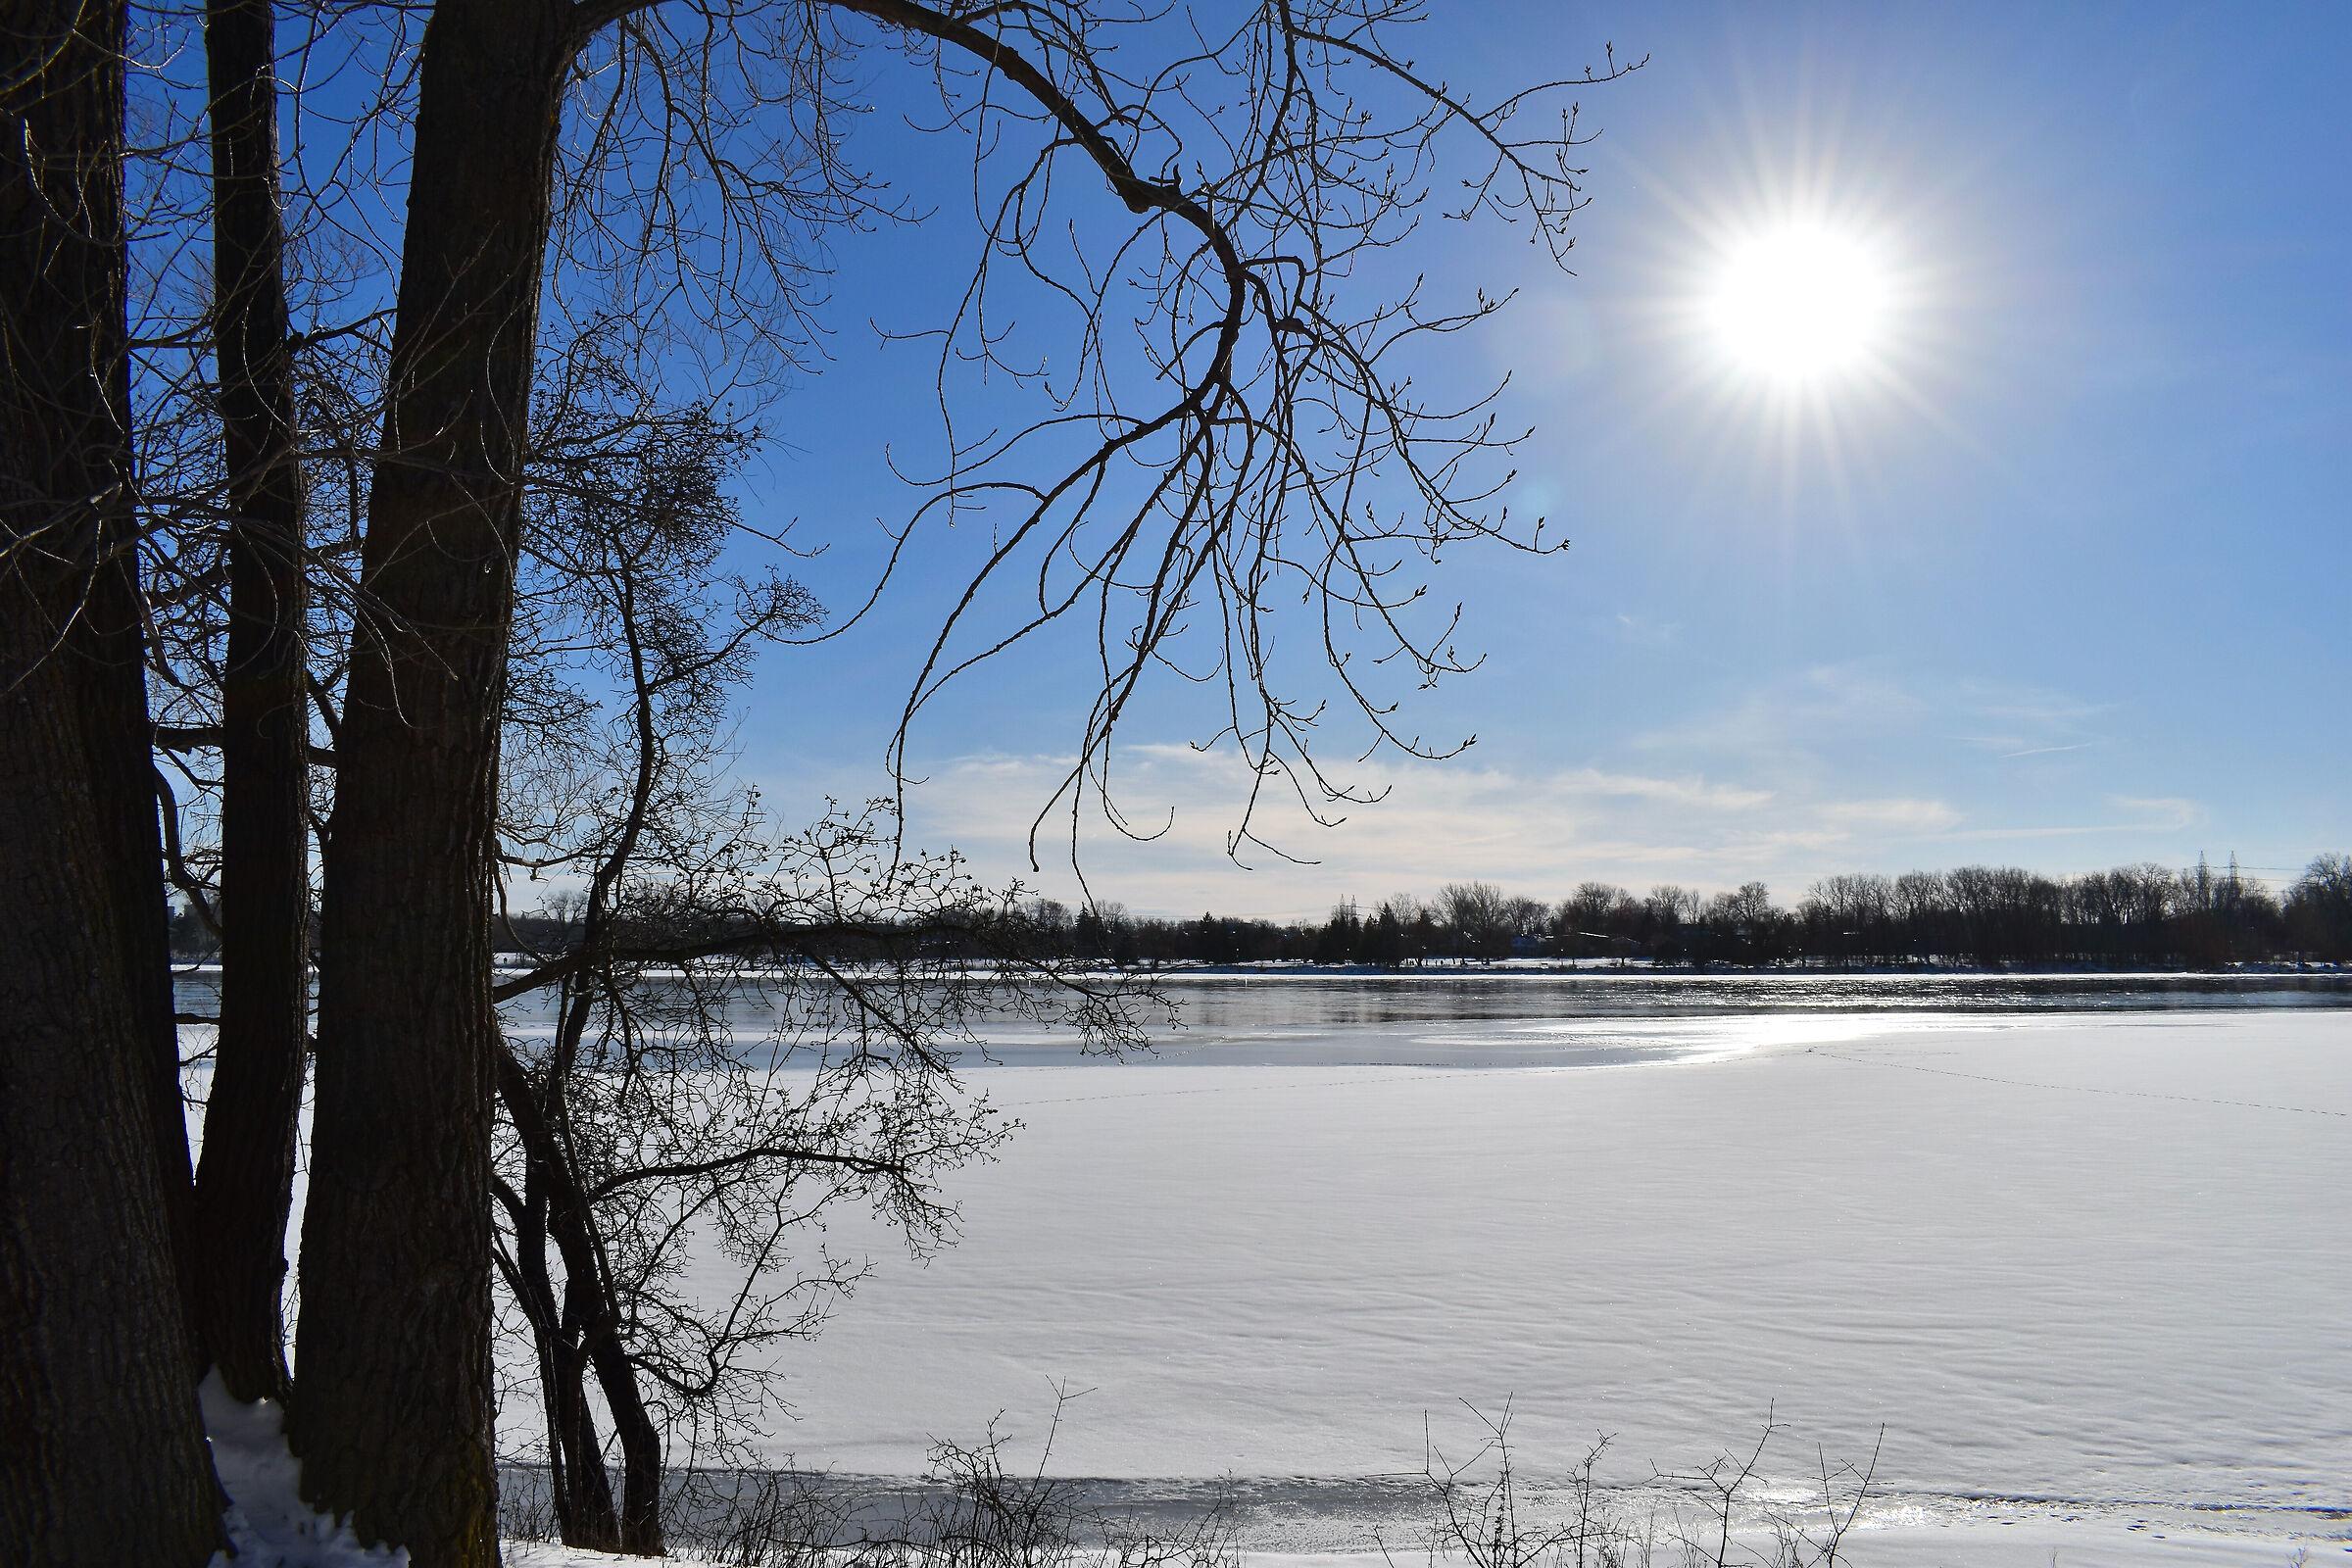 Winter land on the Rivière des Prairies...